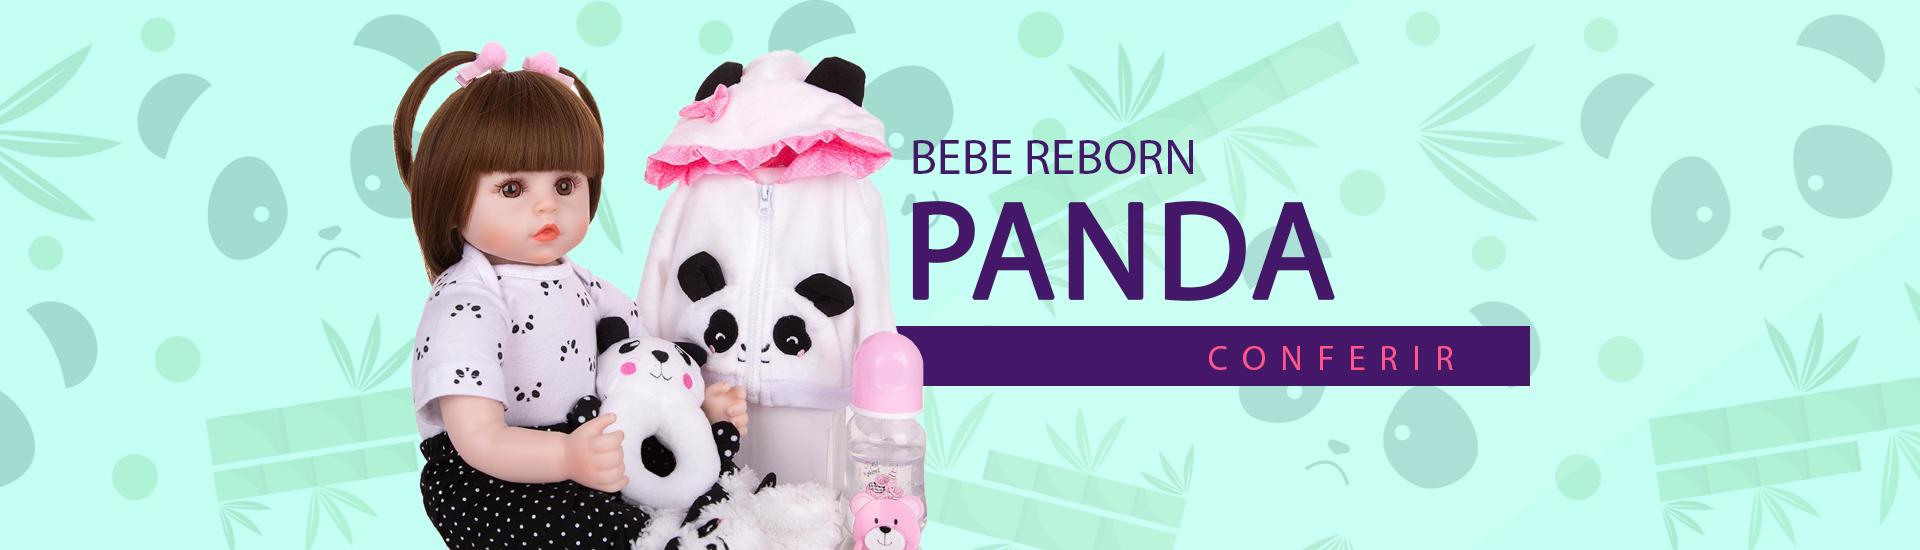 BEBE REBORN PANDA